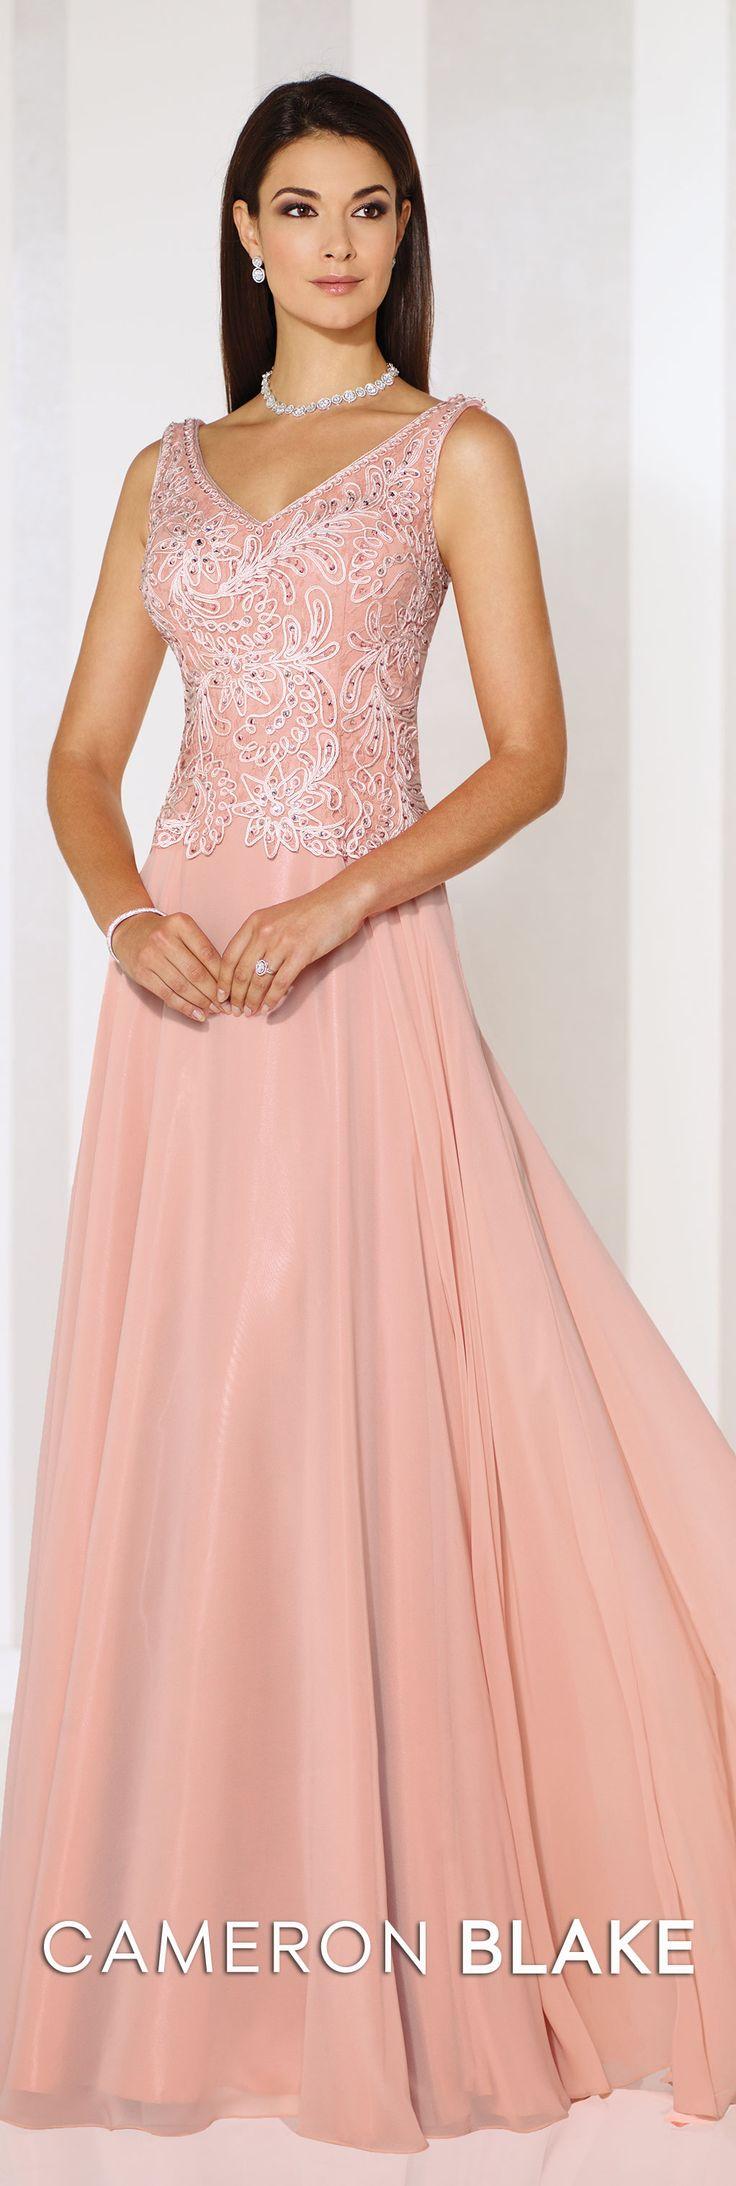 Cameron Blake Spring 2016 - Style No. 116654 #formaleveningdresses  Elizabeth Classica Necklace and Elizabeth Earrings www.davidtuteraembellish.com